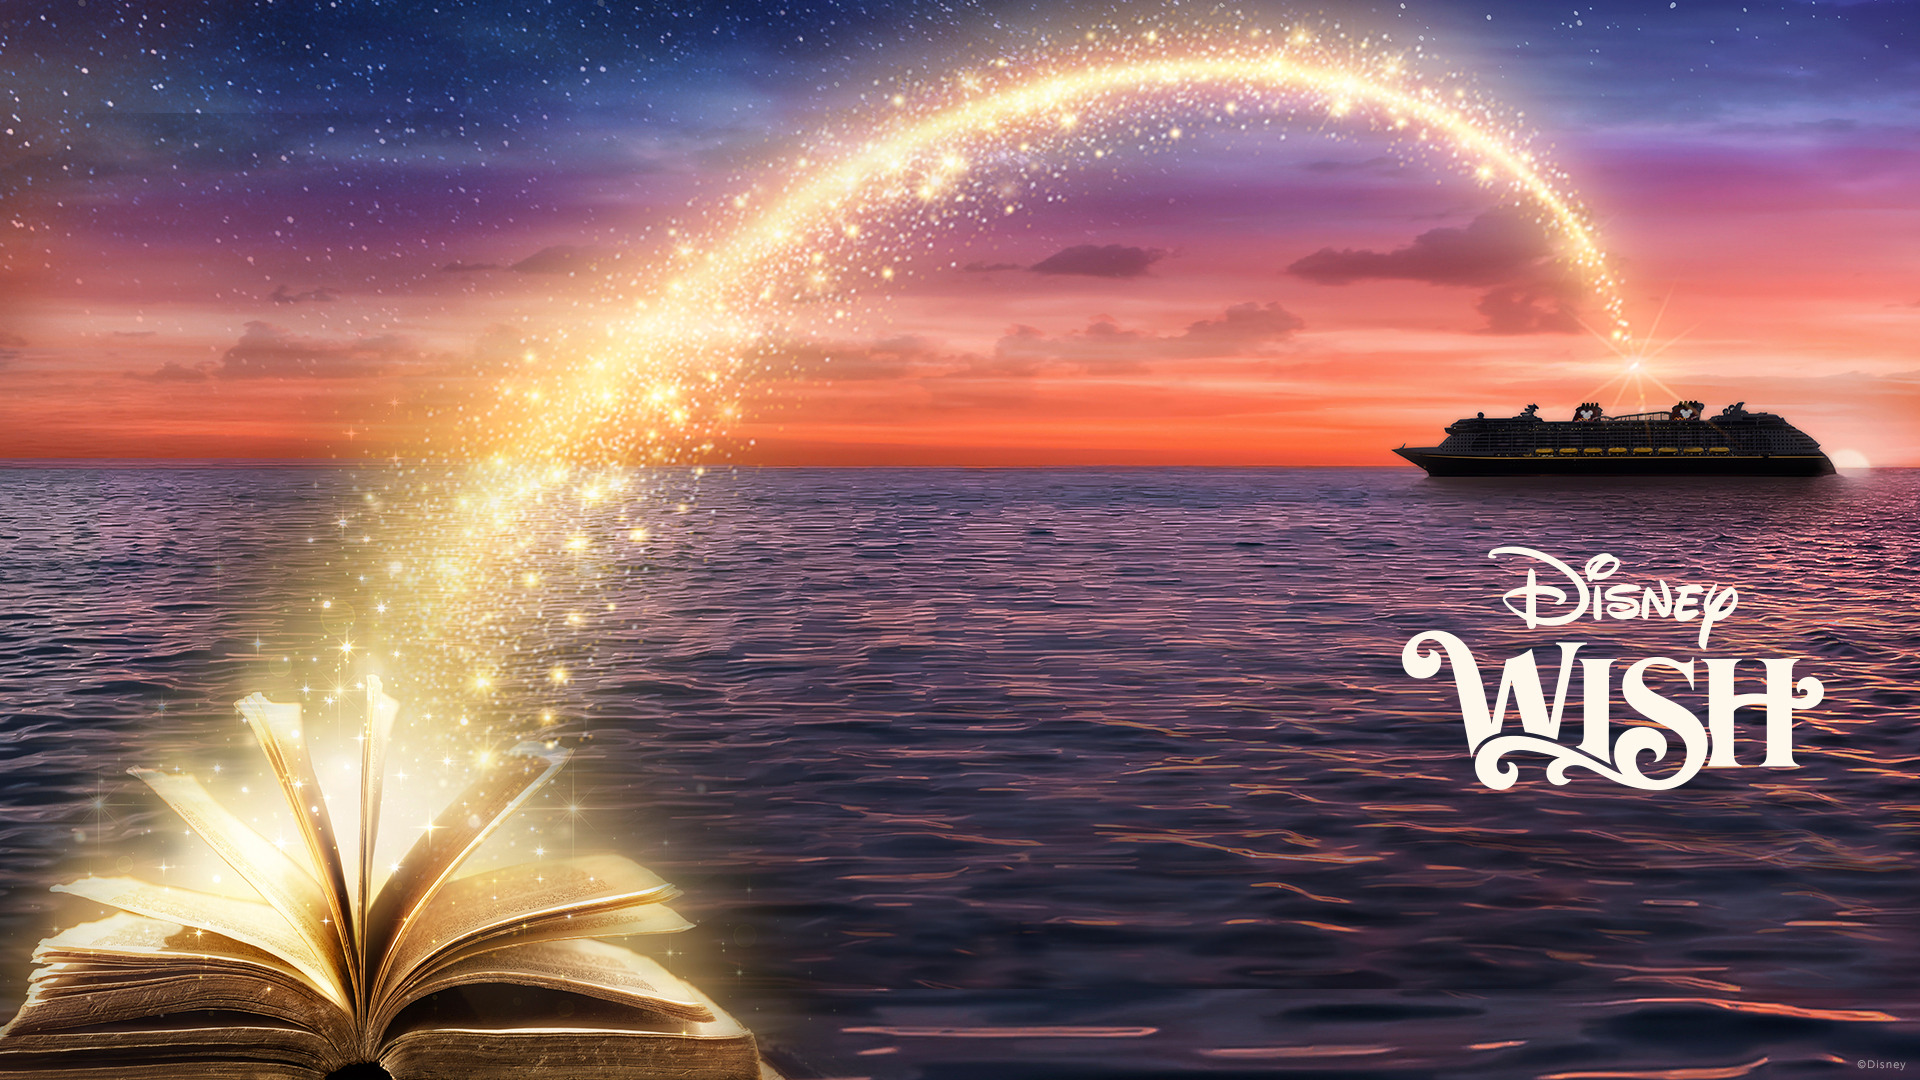 disney-wish-disney-cruise-line-background